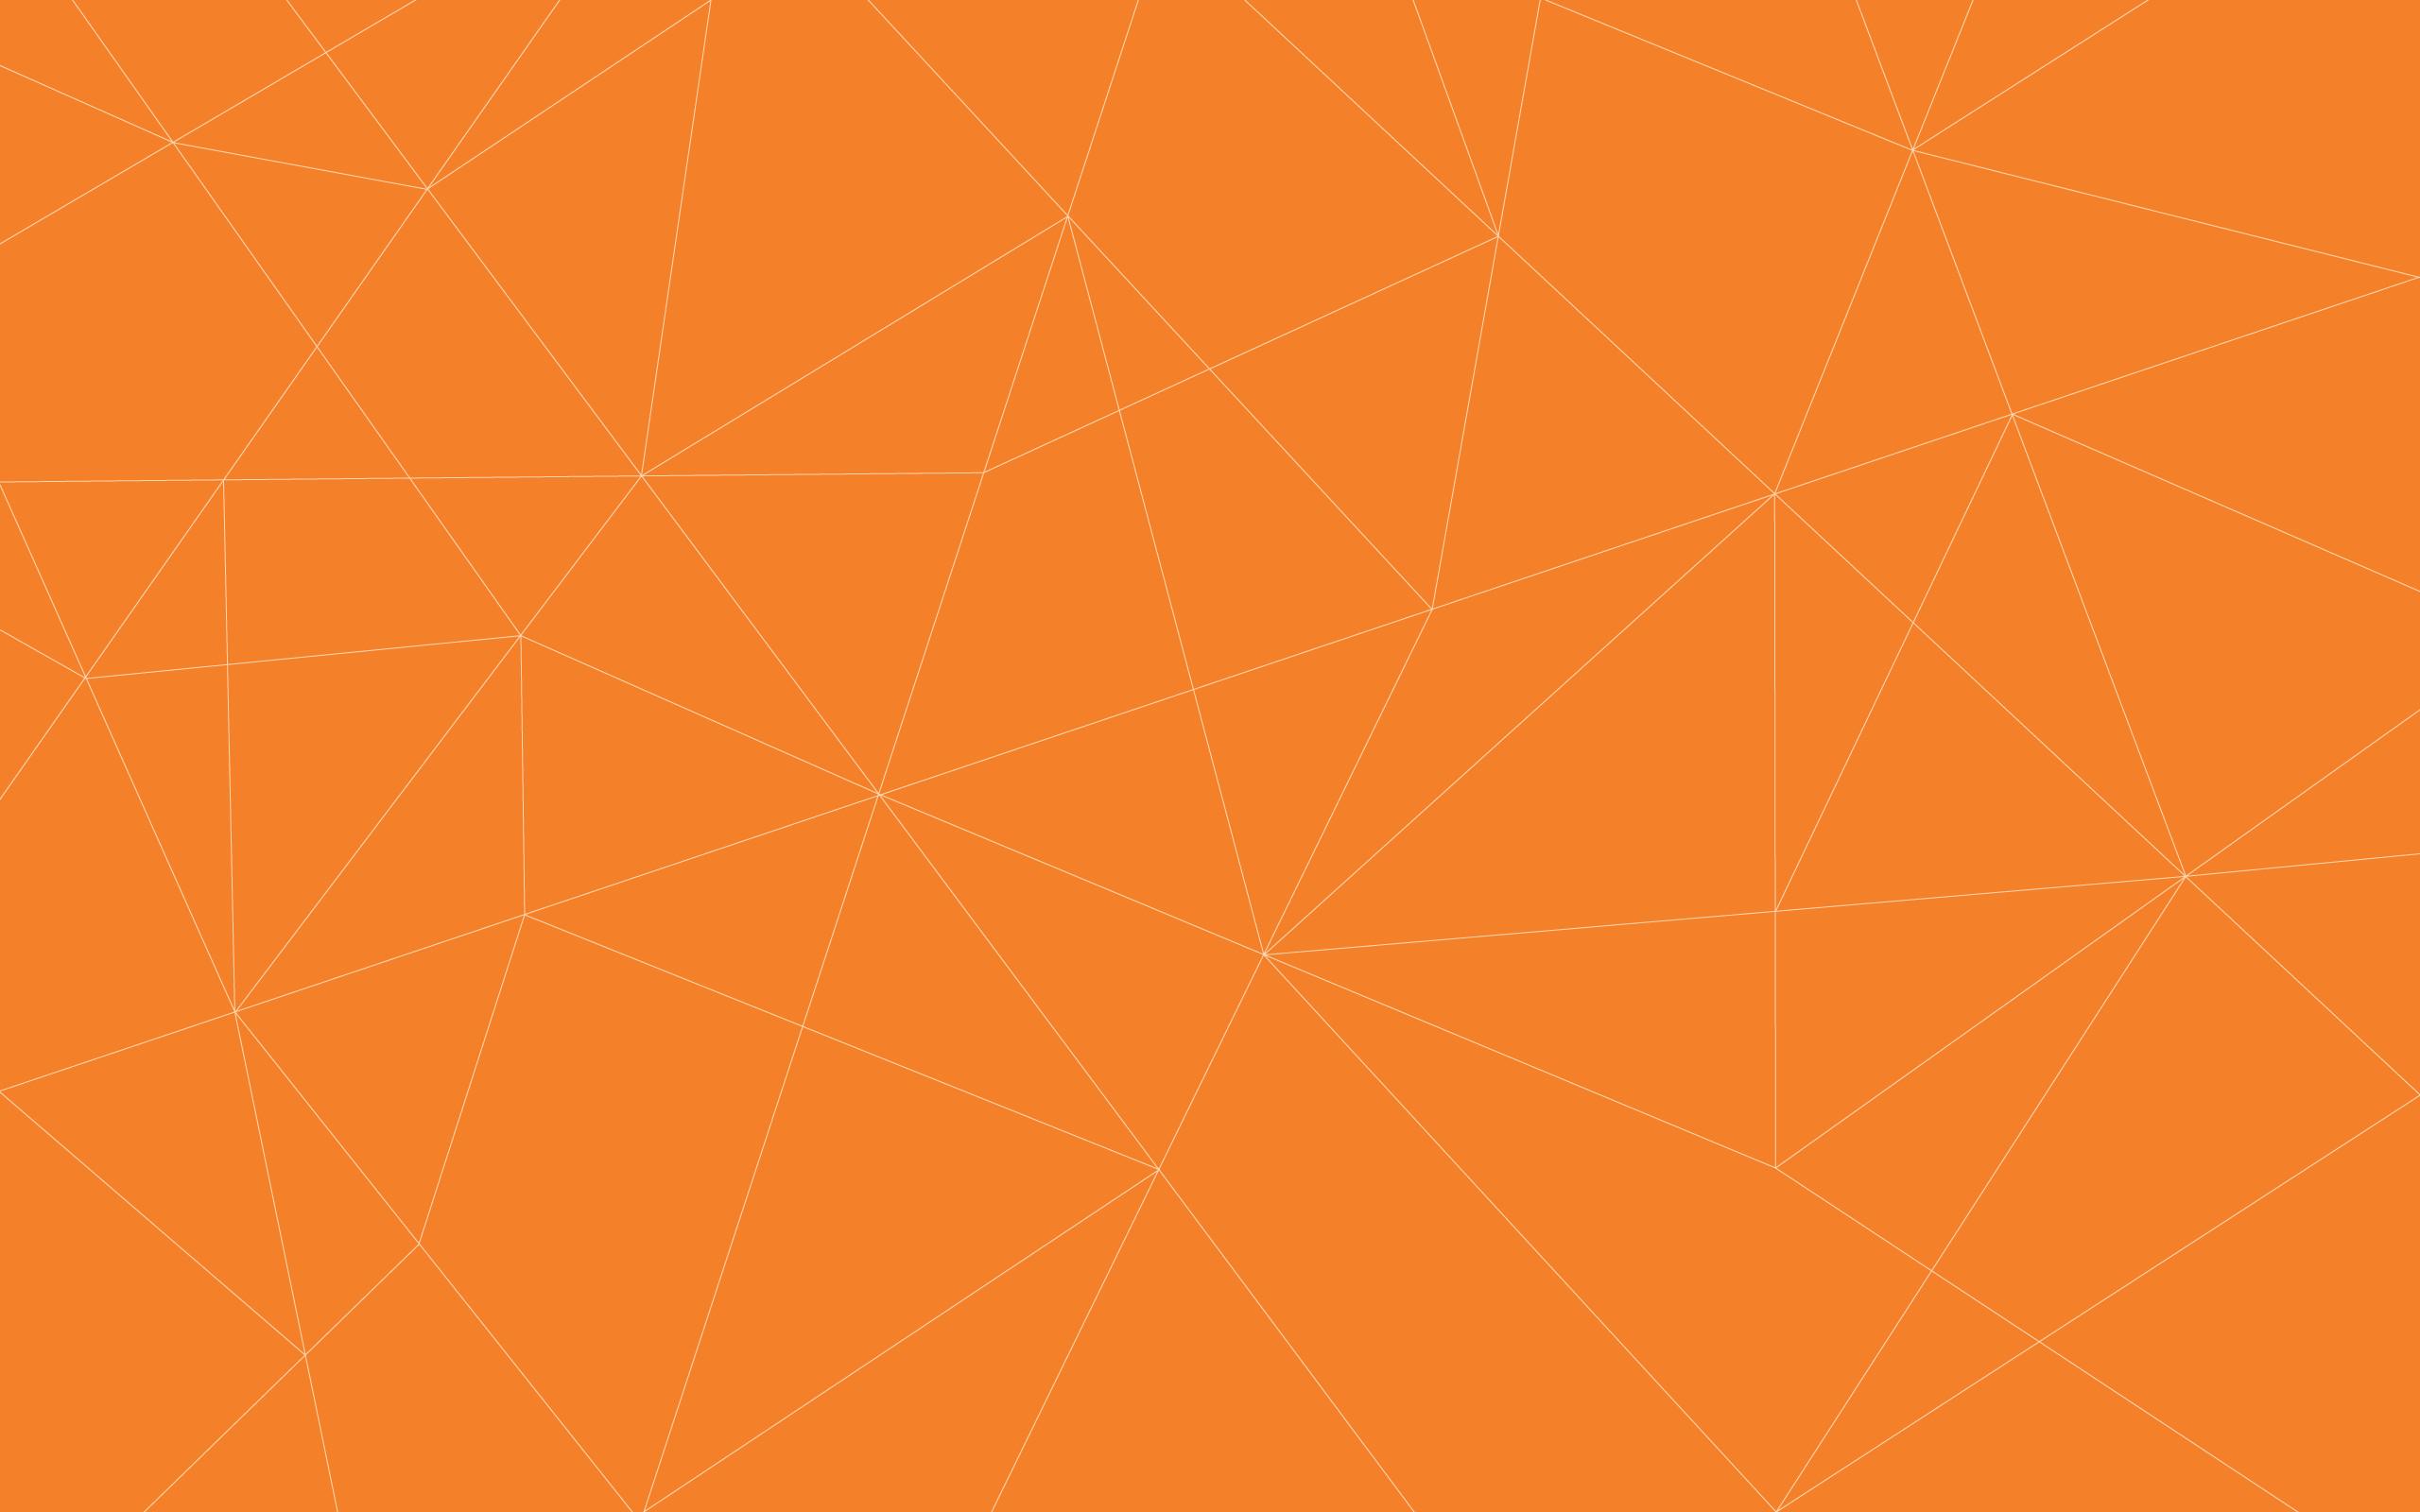 Sfondi arancioni immagini